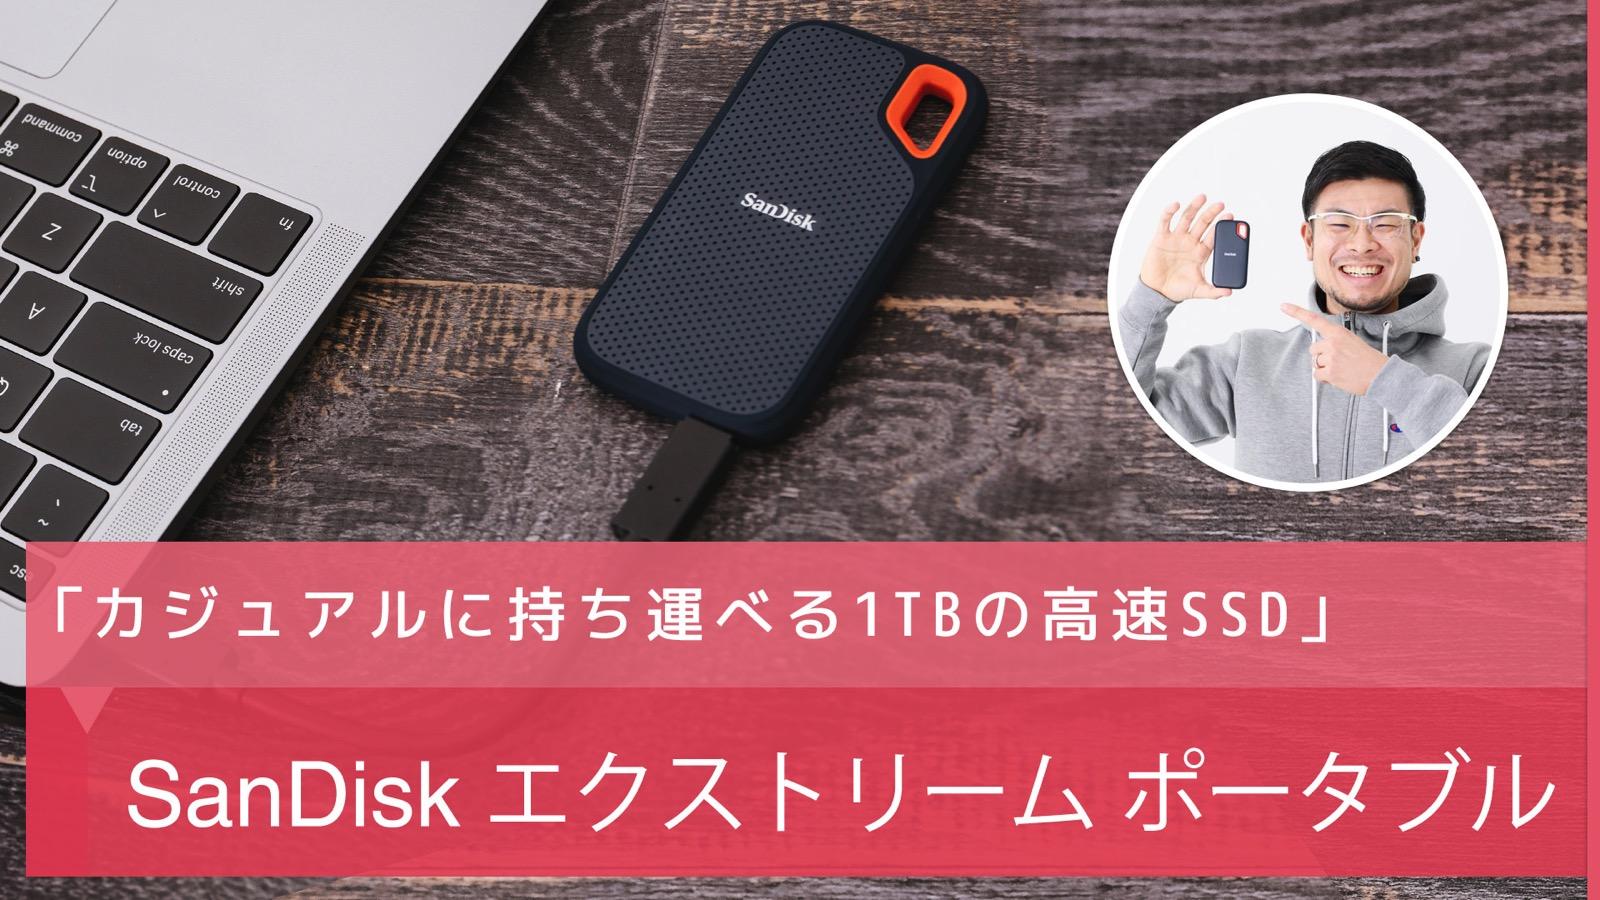 Sandisk1tb